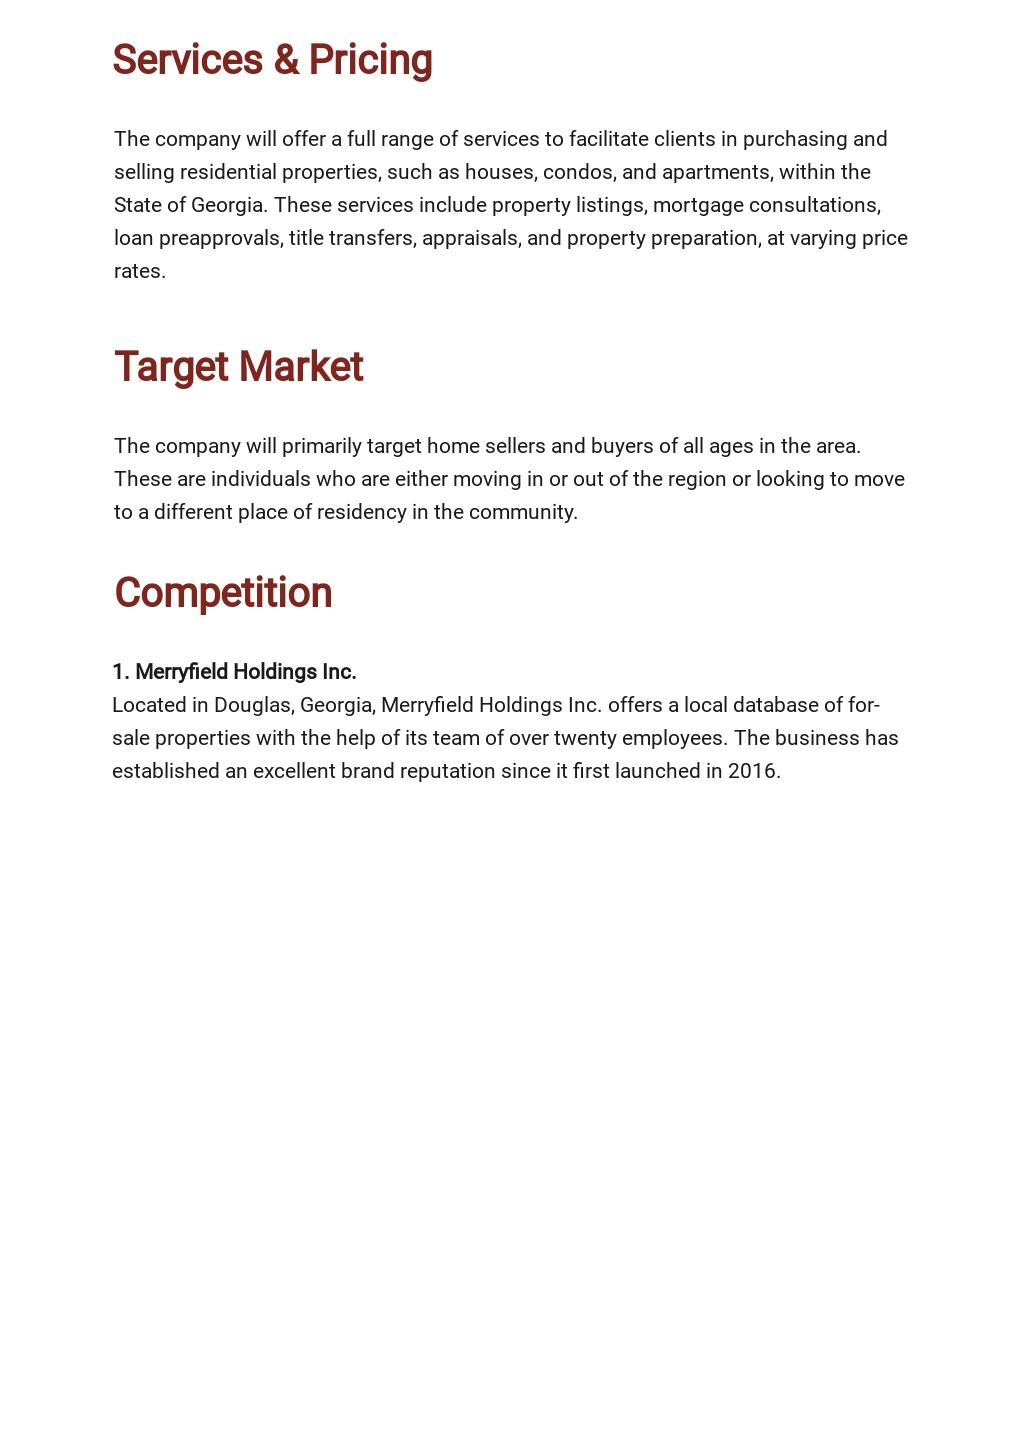 Free Sample Real Estate Business Plan Template 2.jpe